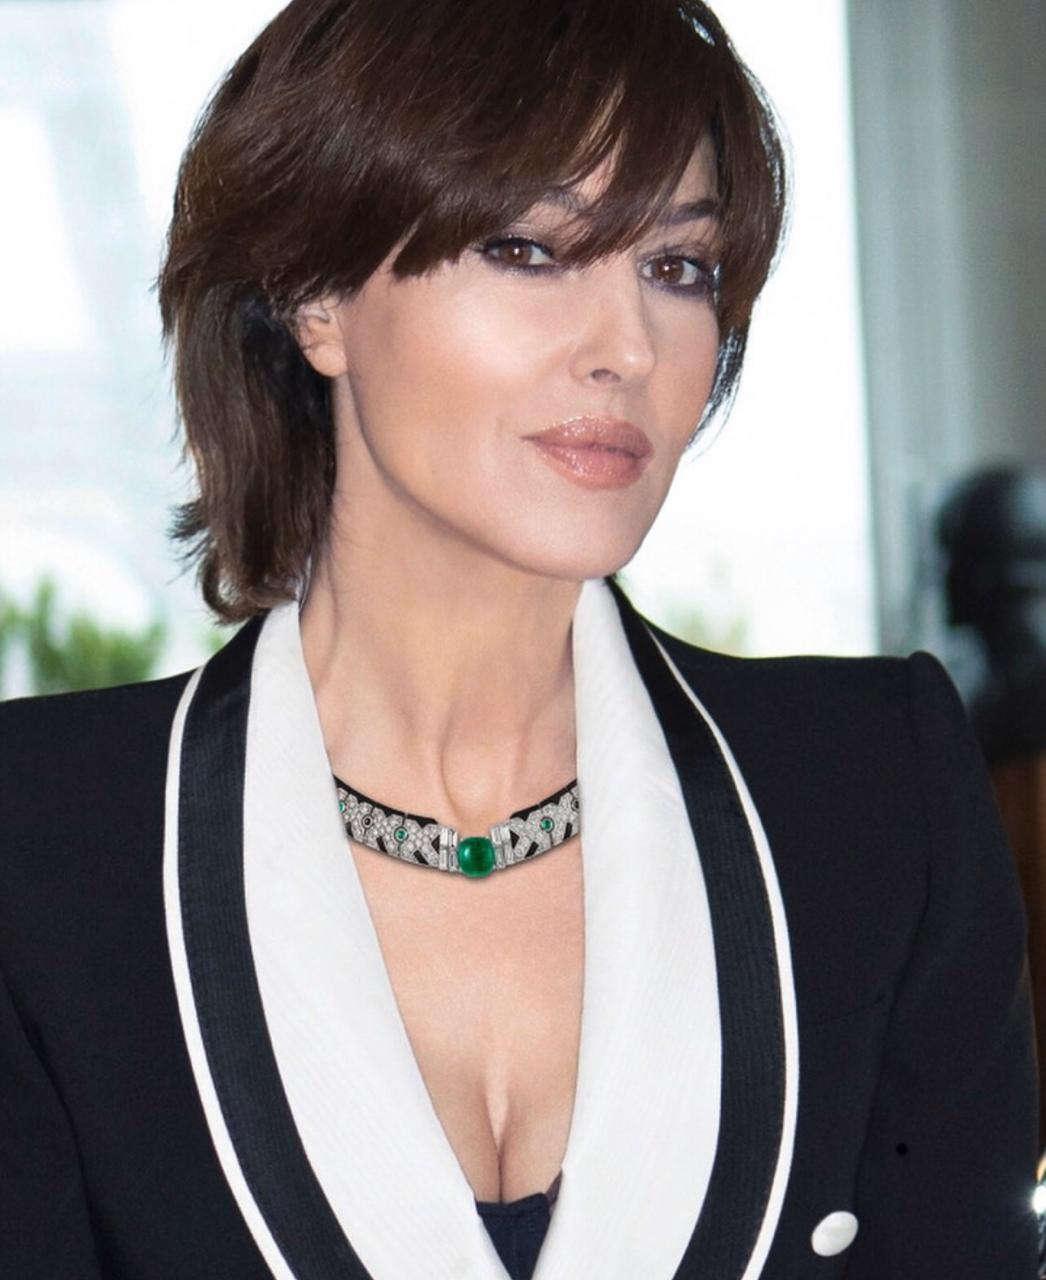 مونيكا بيلوتشي (1)